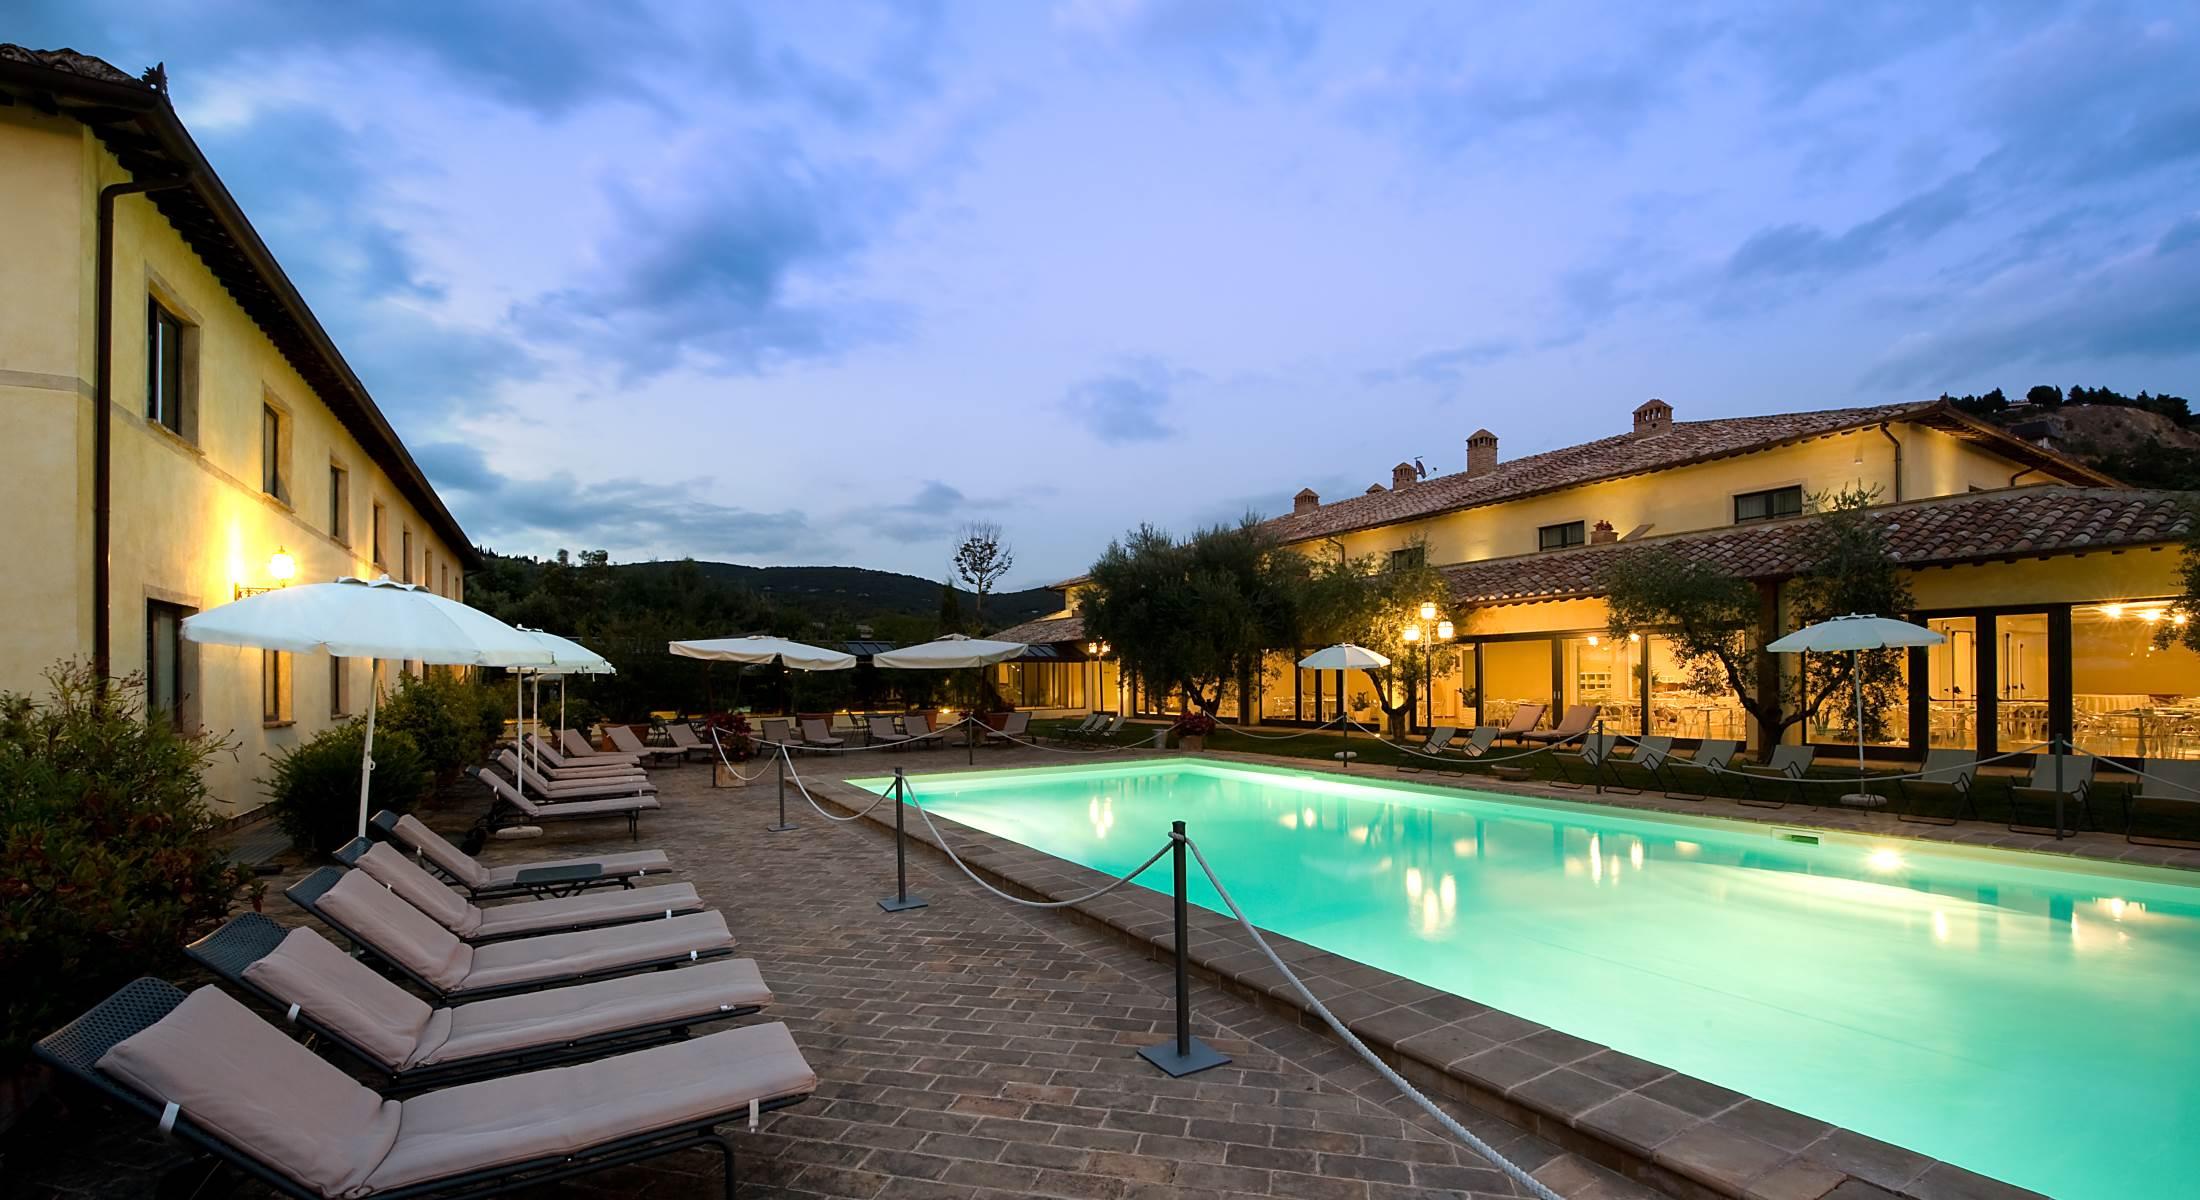 laura brunelli perugia hotels - photo#22